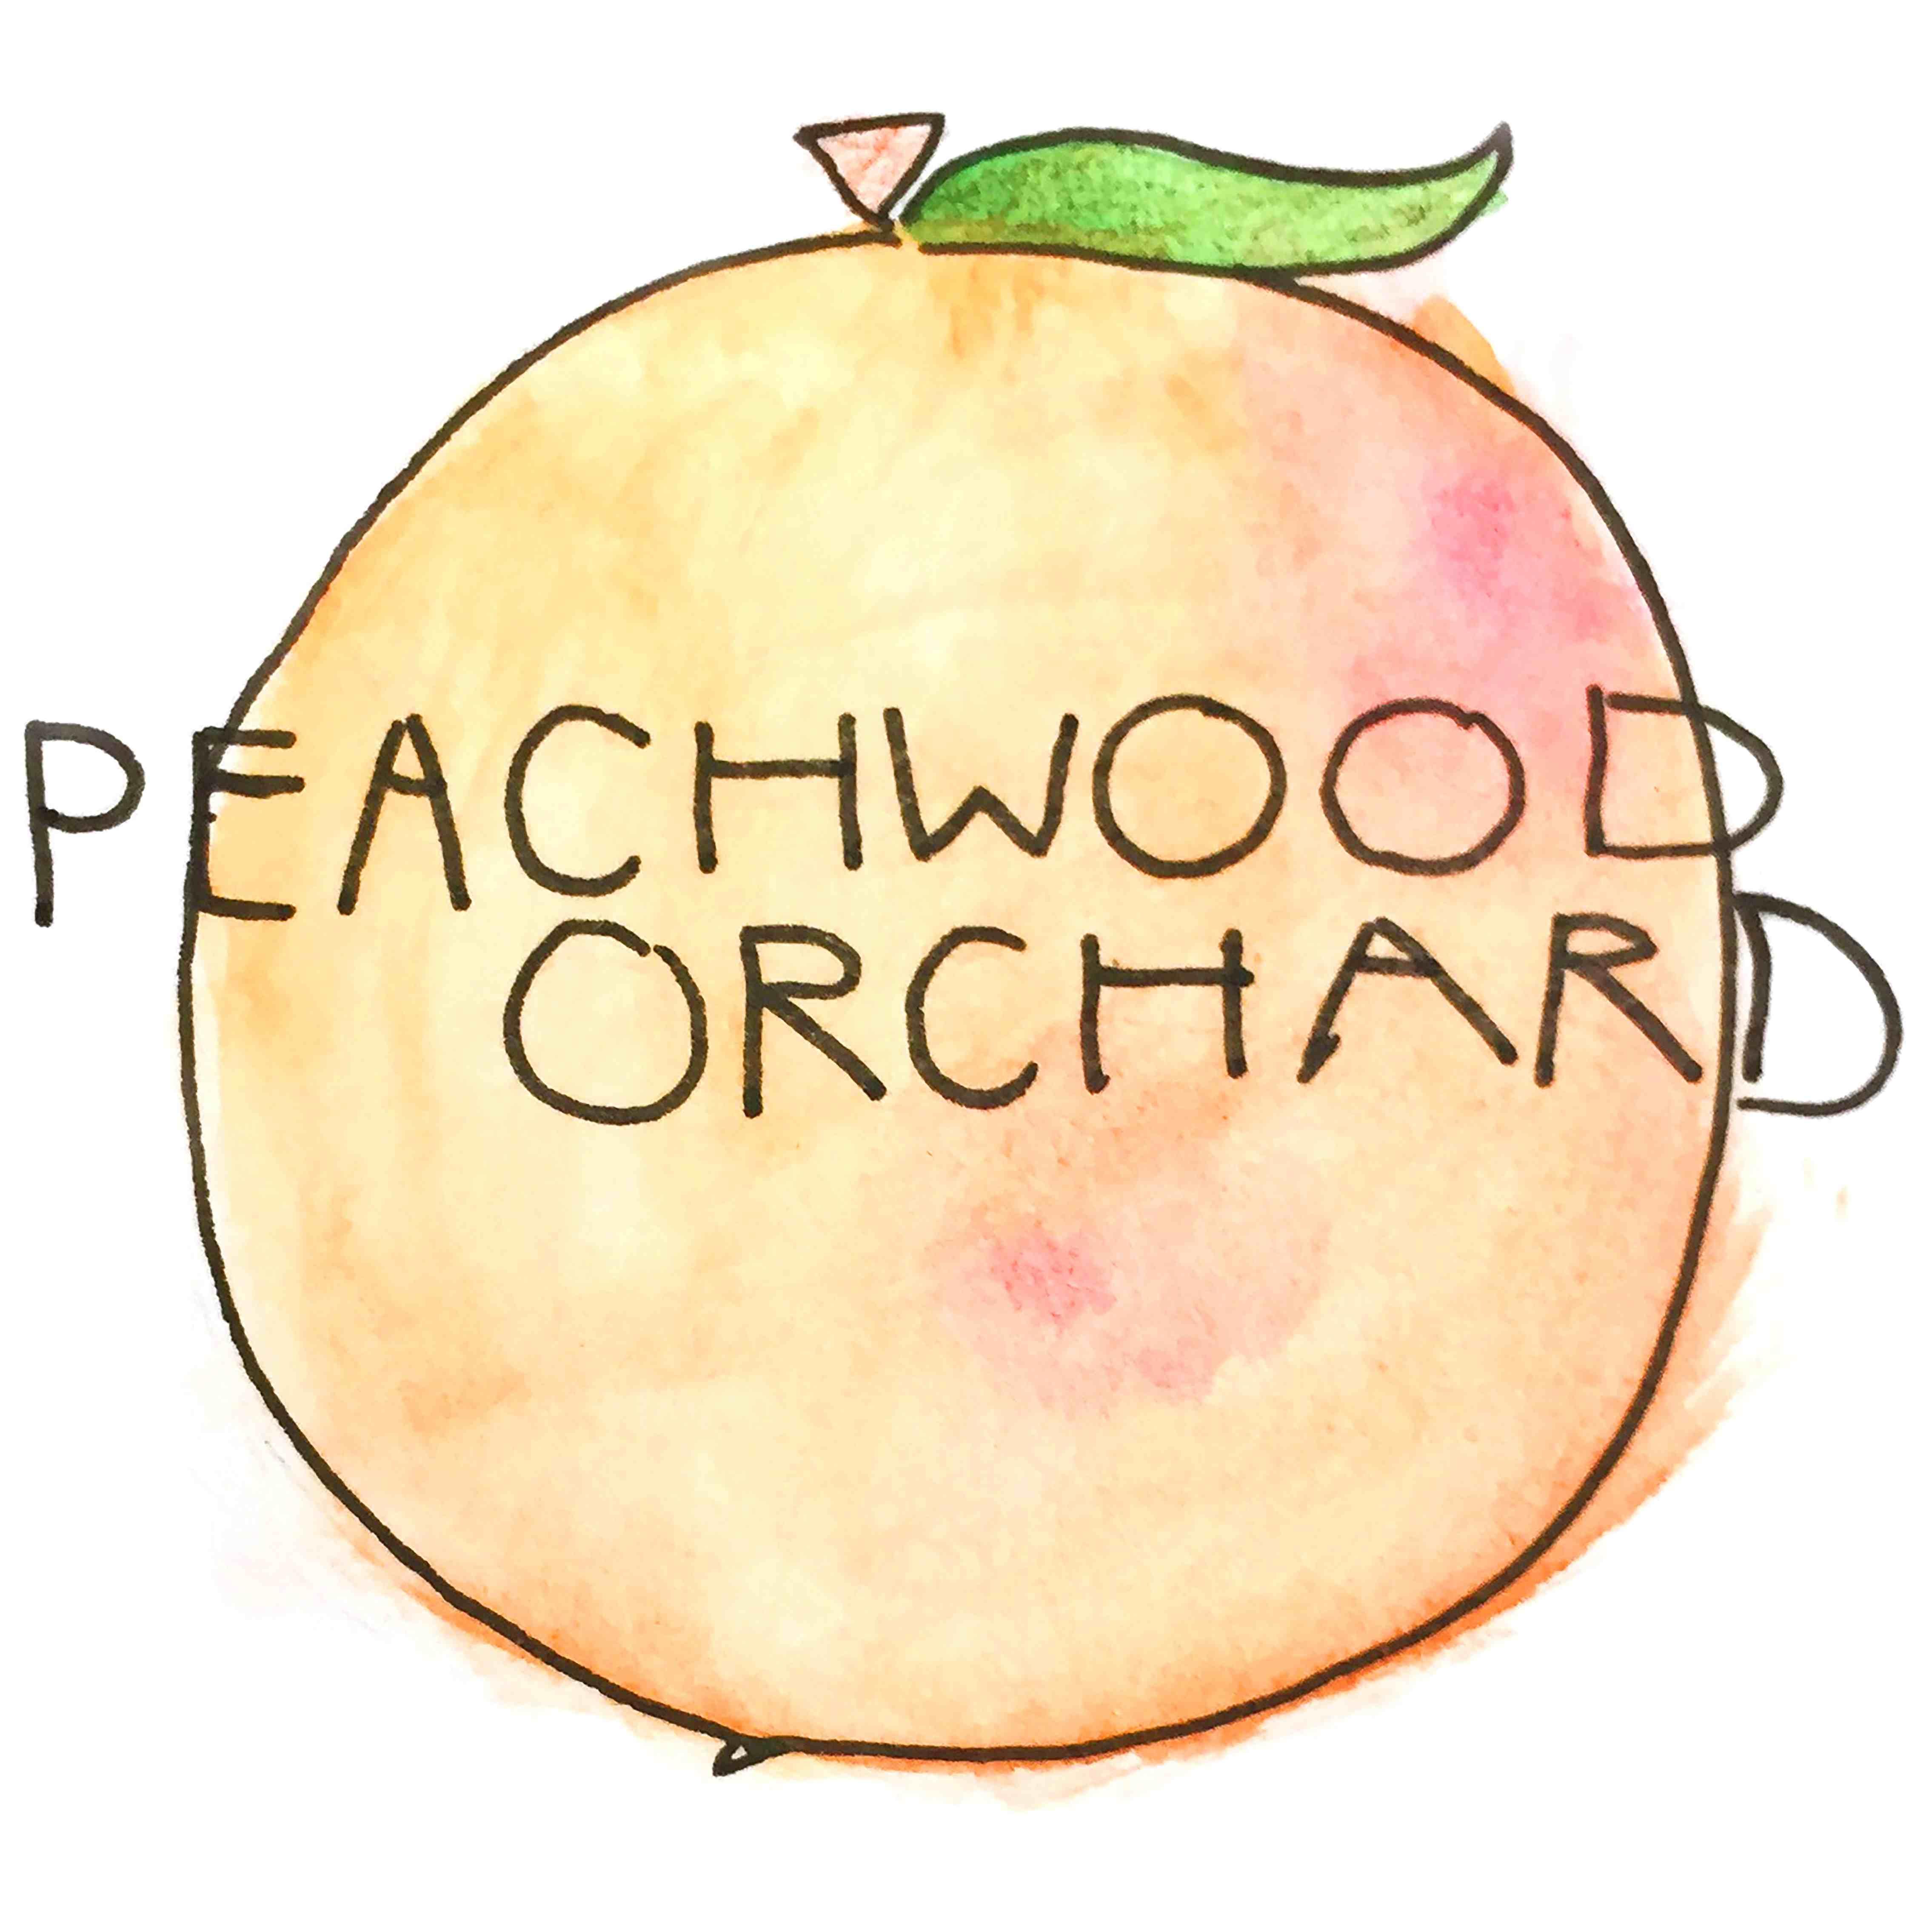 Peachwood Orchard